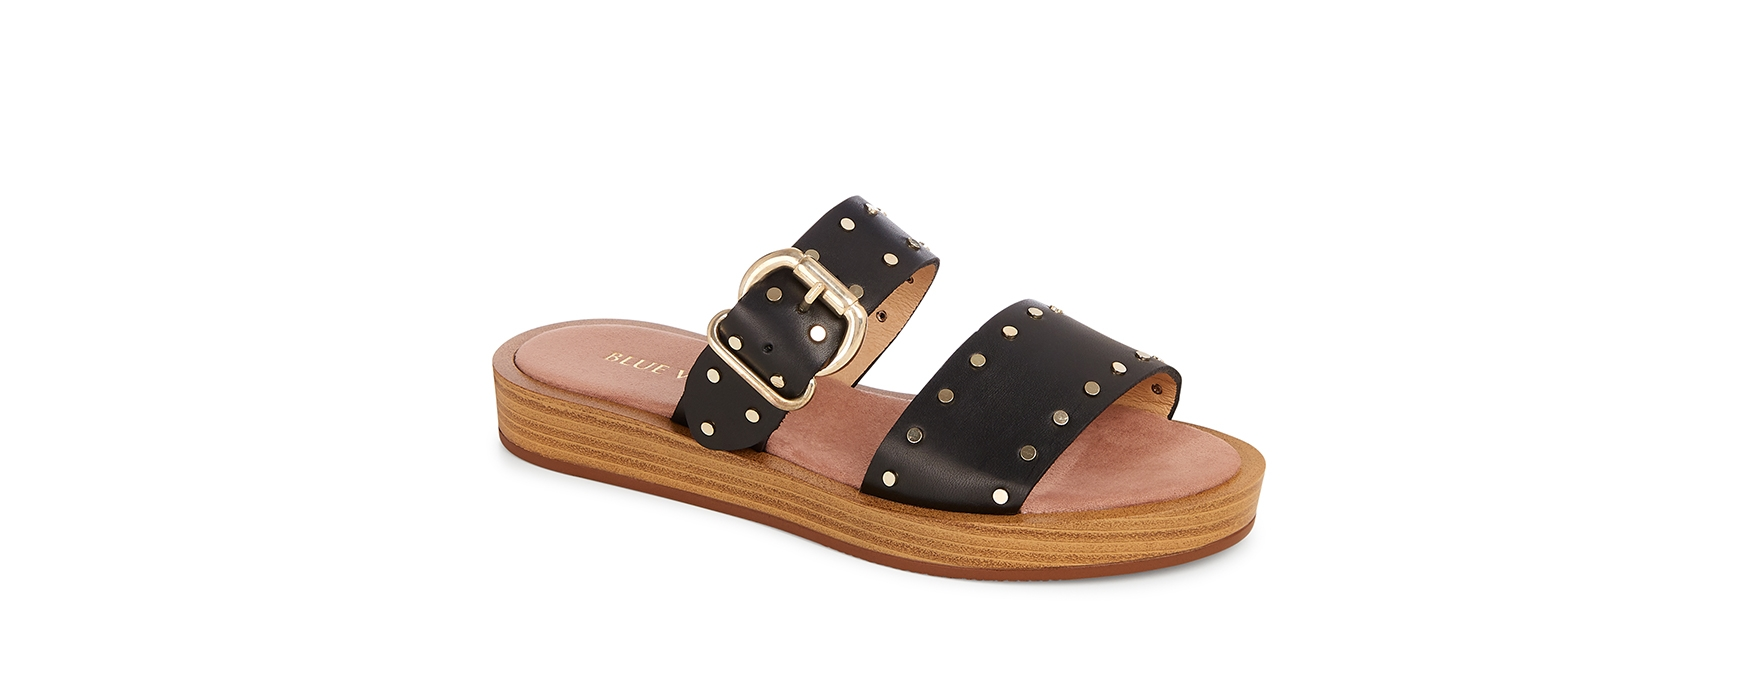 8_18-wedge-sandals.jpg